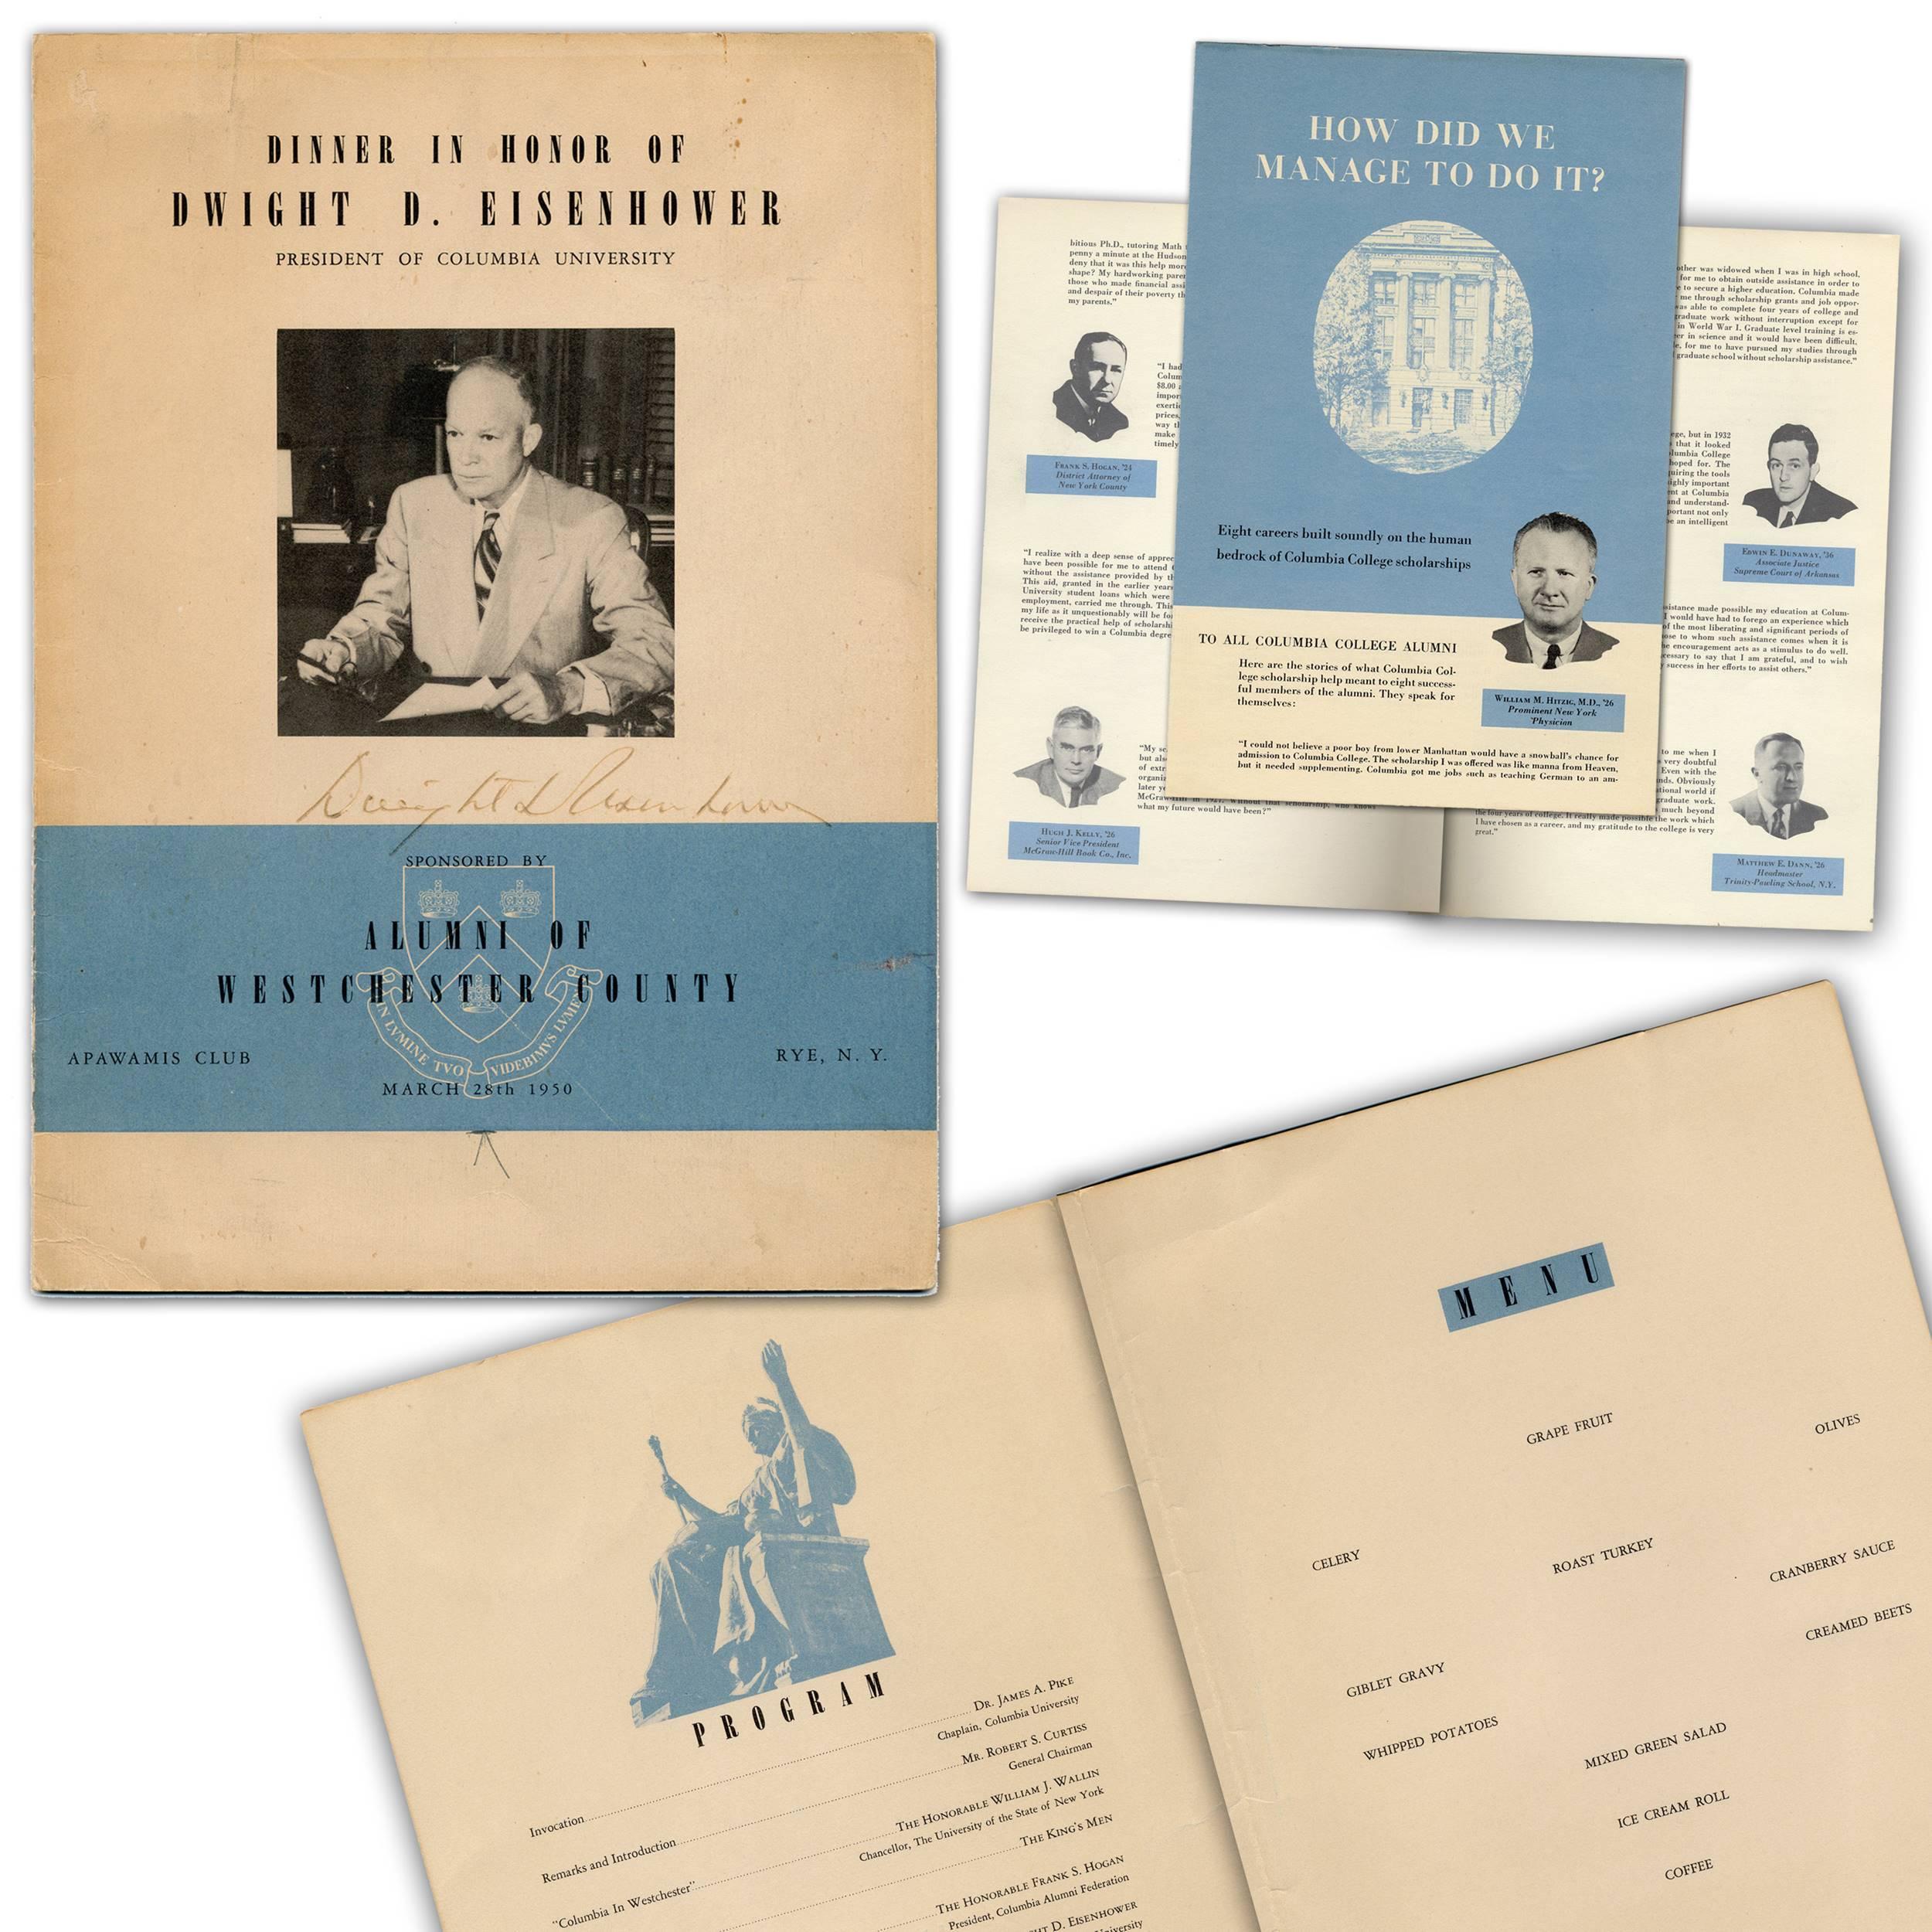 Dwight D. Eisenhower, Columbia University President, Signed Program from Westchester County Alumni Dinner